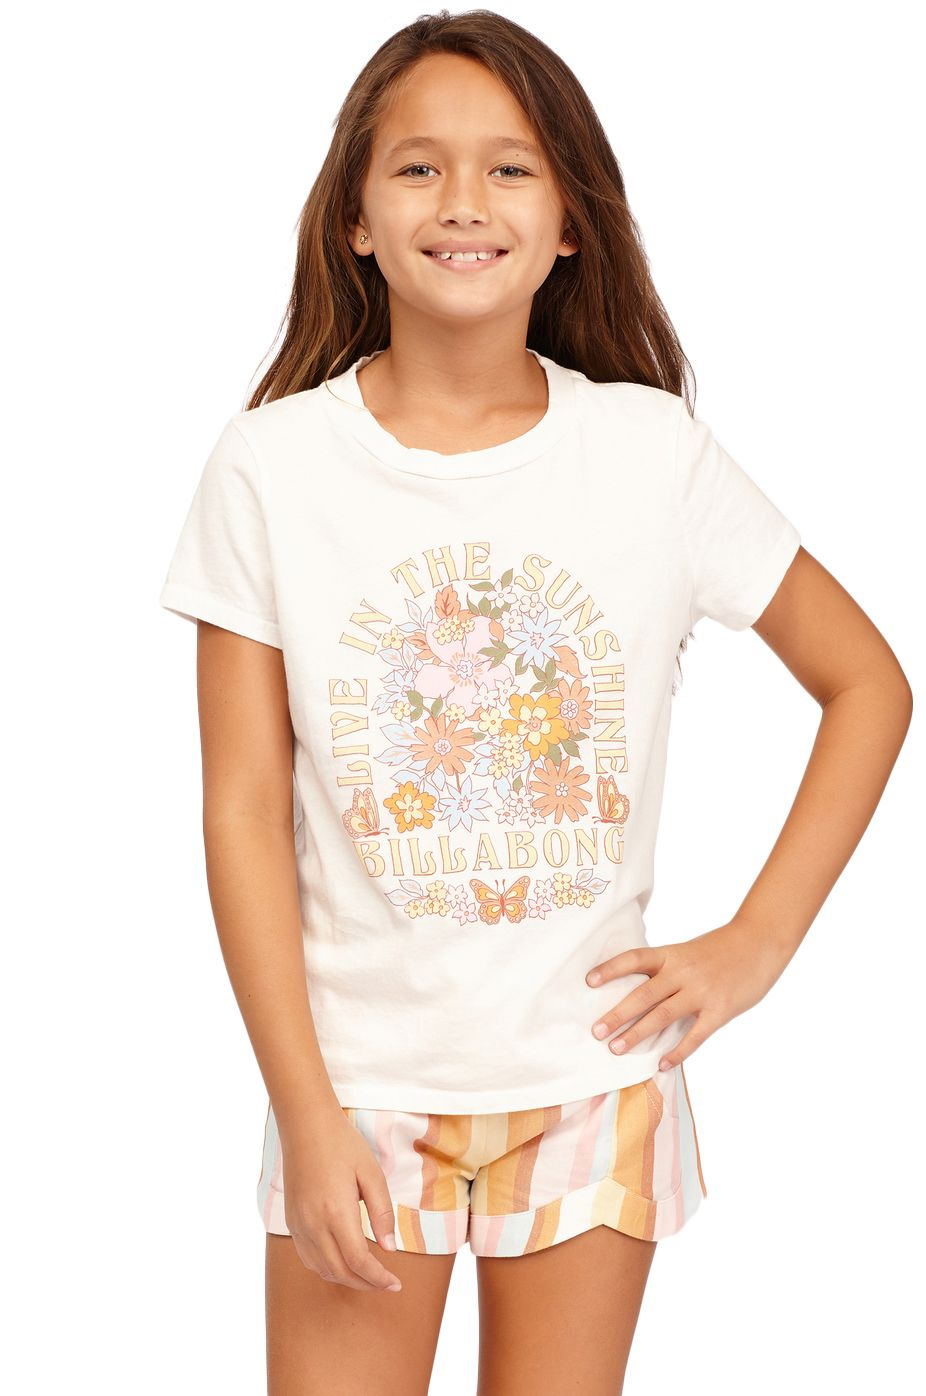 Billabong T-Shirt LIVING IN SUNSHINE Salt Crystal